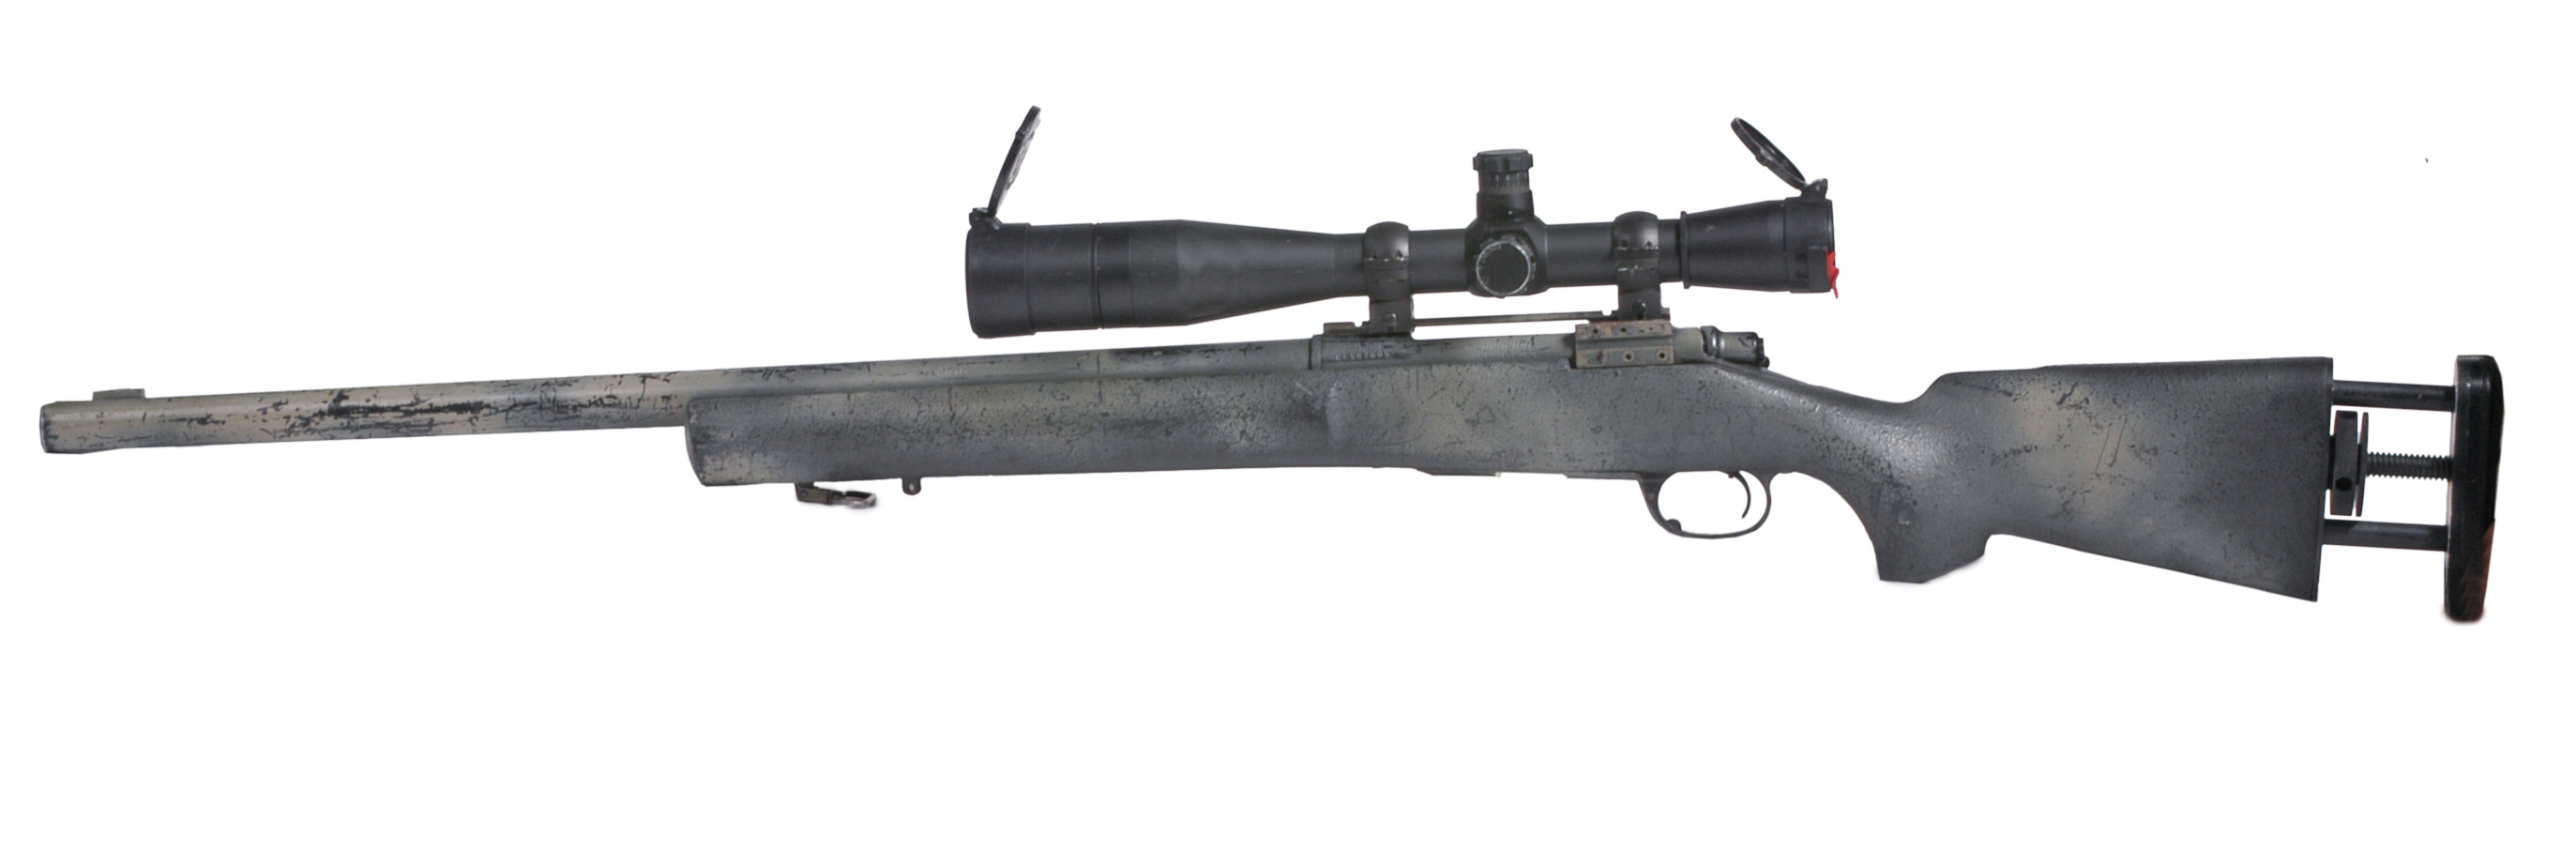 m24a2 sniper rifle - photo #25